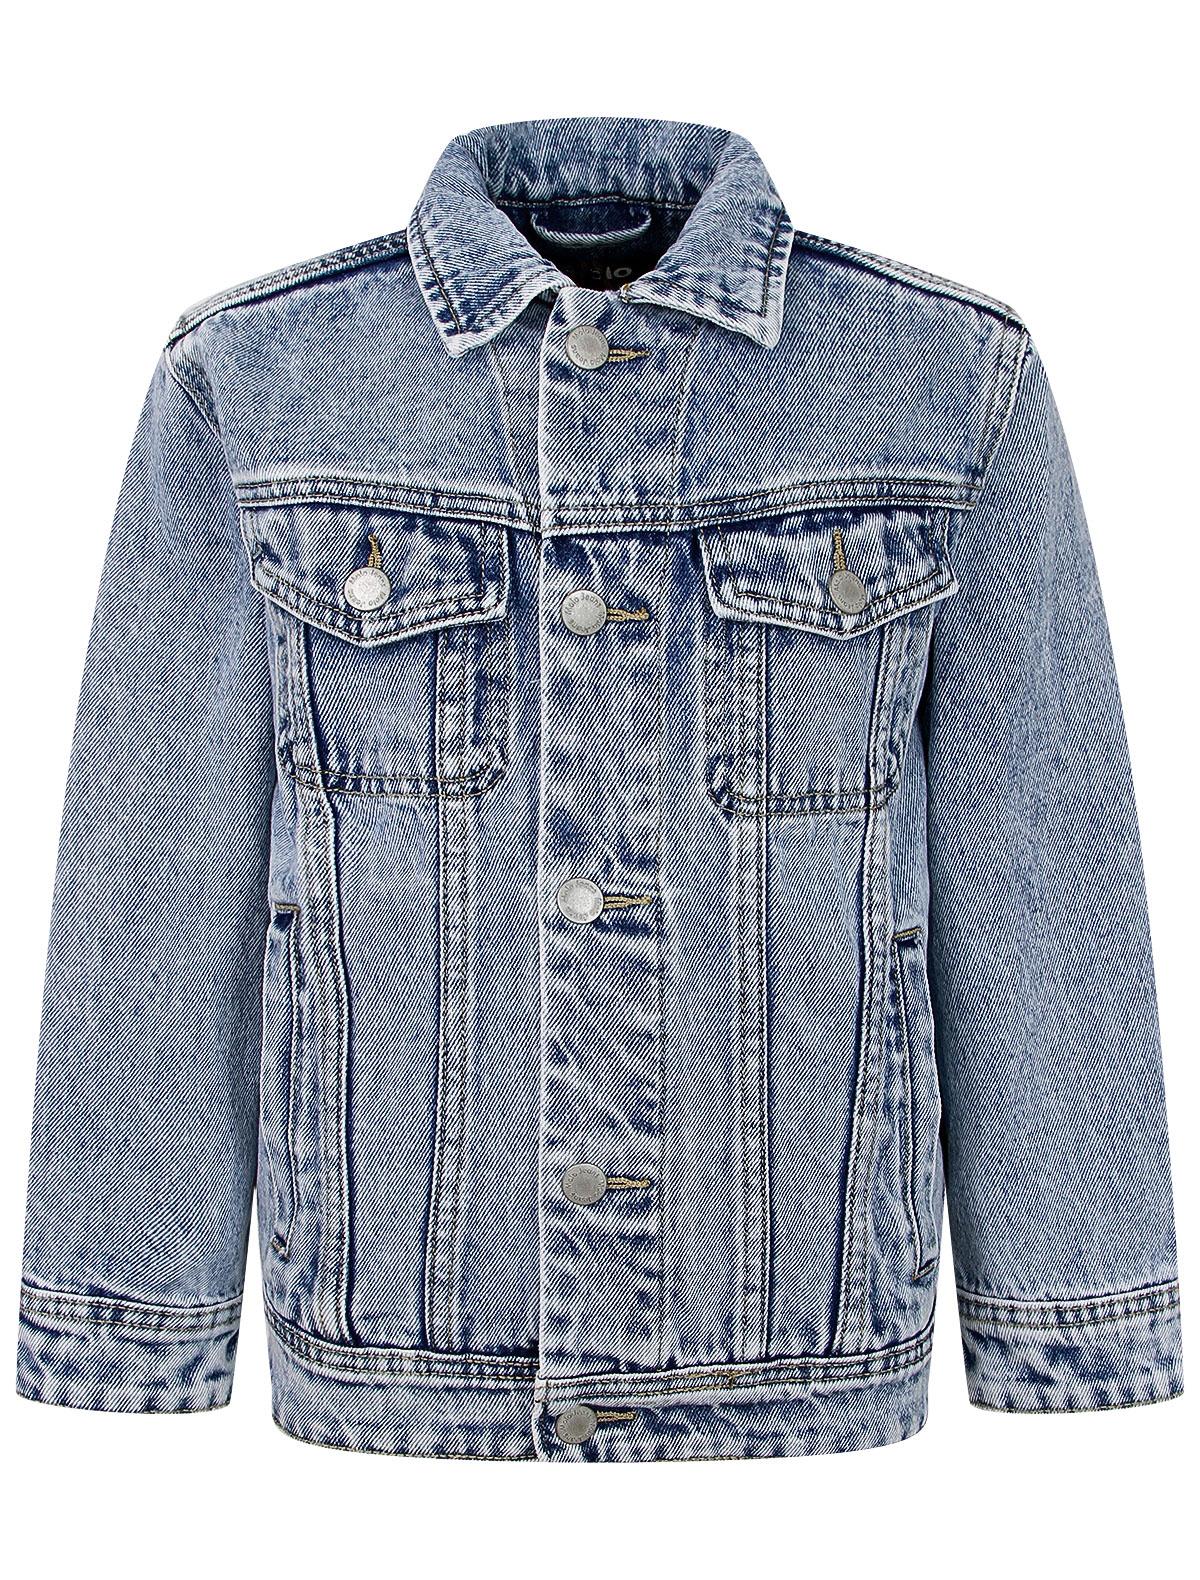 Купить 2292194, Куртка MOLO, синий, 1074529170284